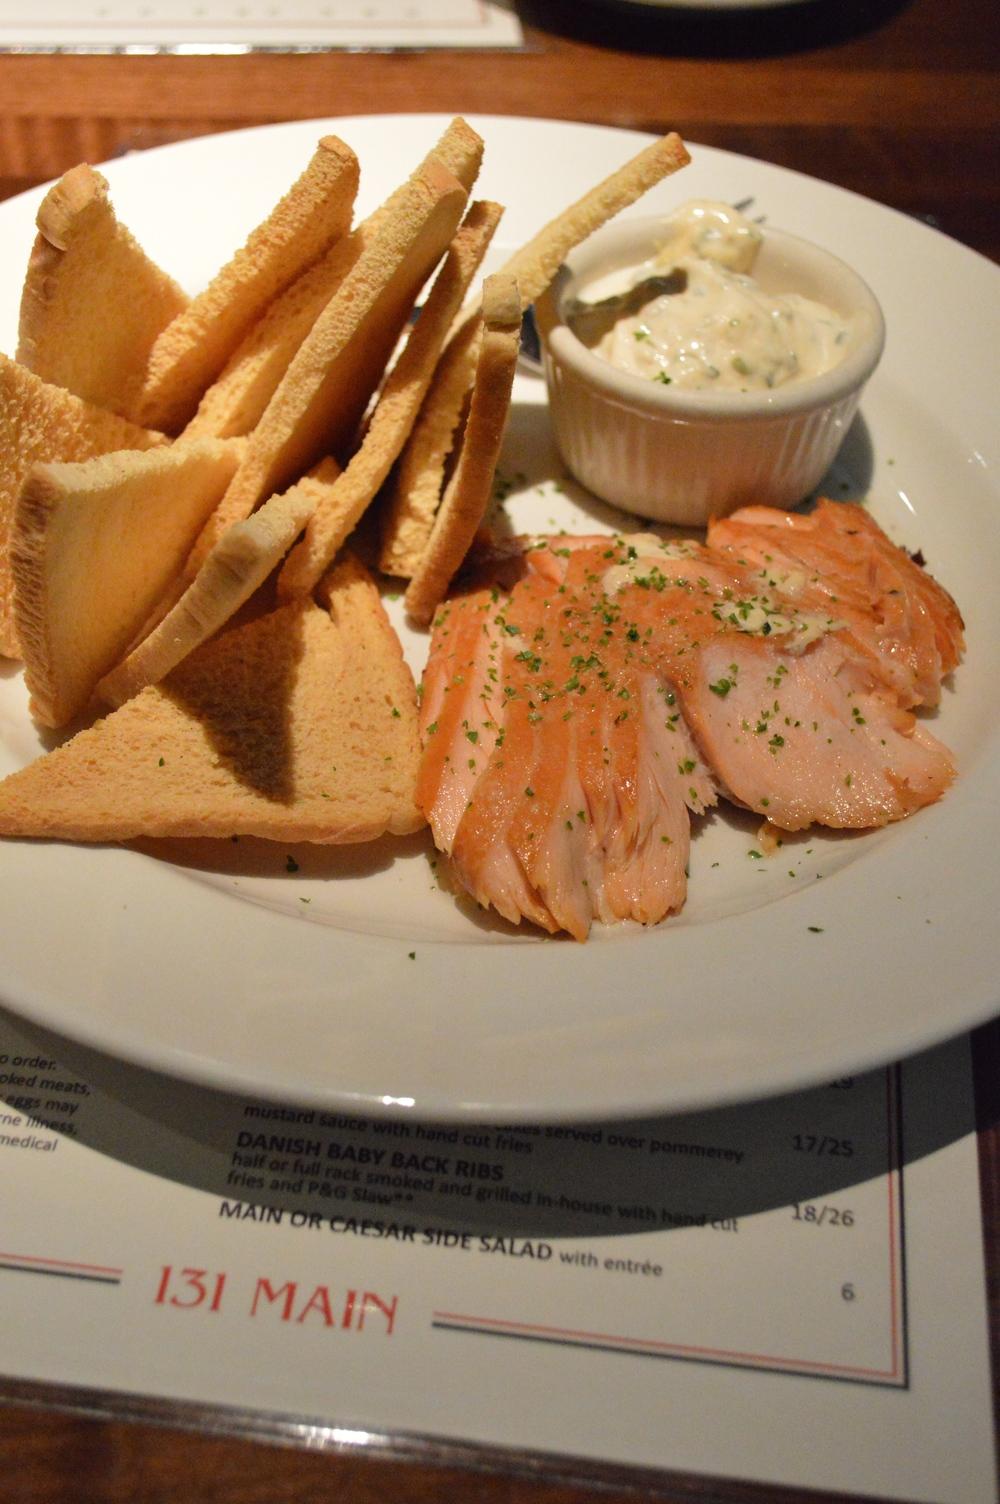 131-Main-Smoked-Salmon-LaurenSchwaiger-Blog.jpg